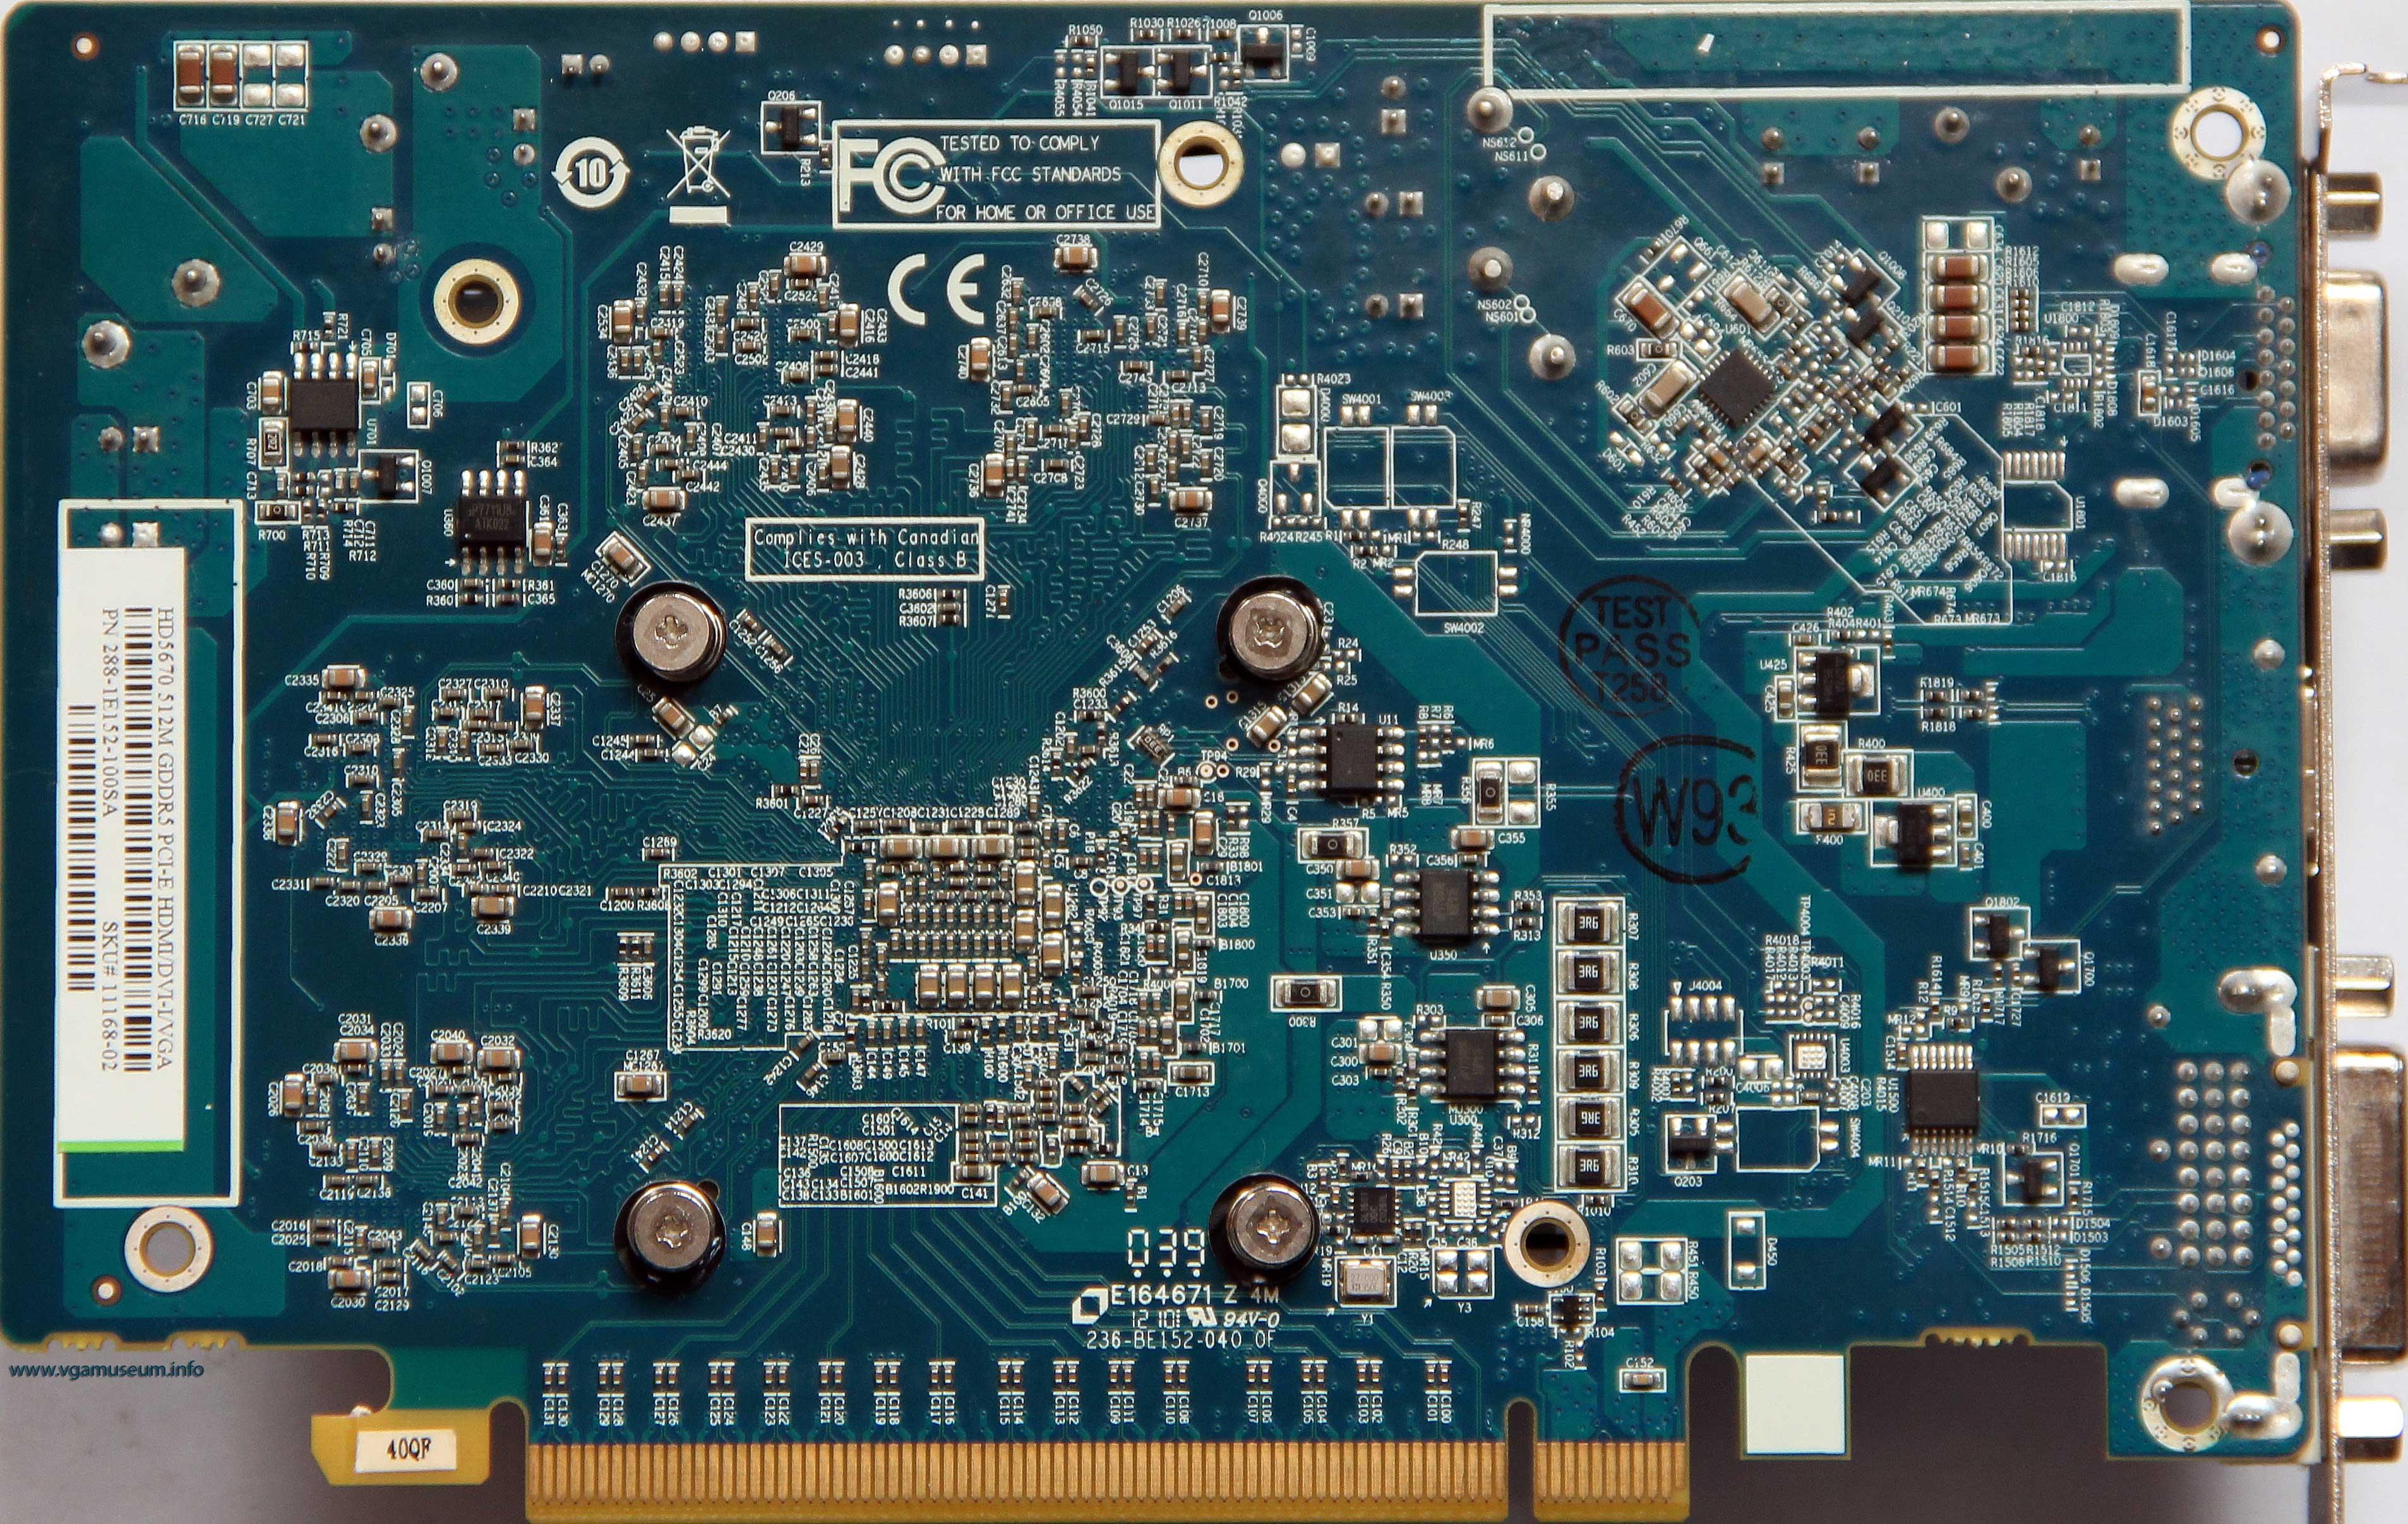 note: card underclock itself to 157/1200 or 400/3600 mhz gpu/mem